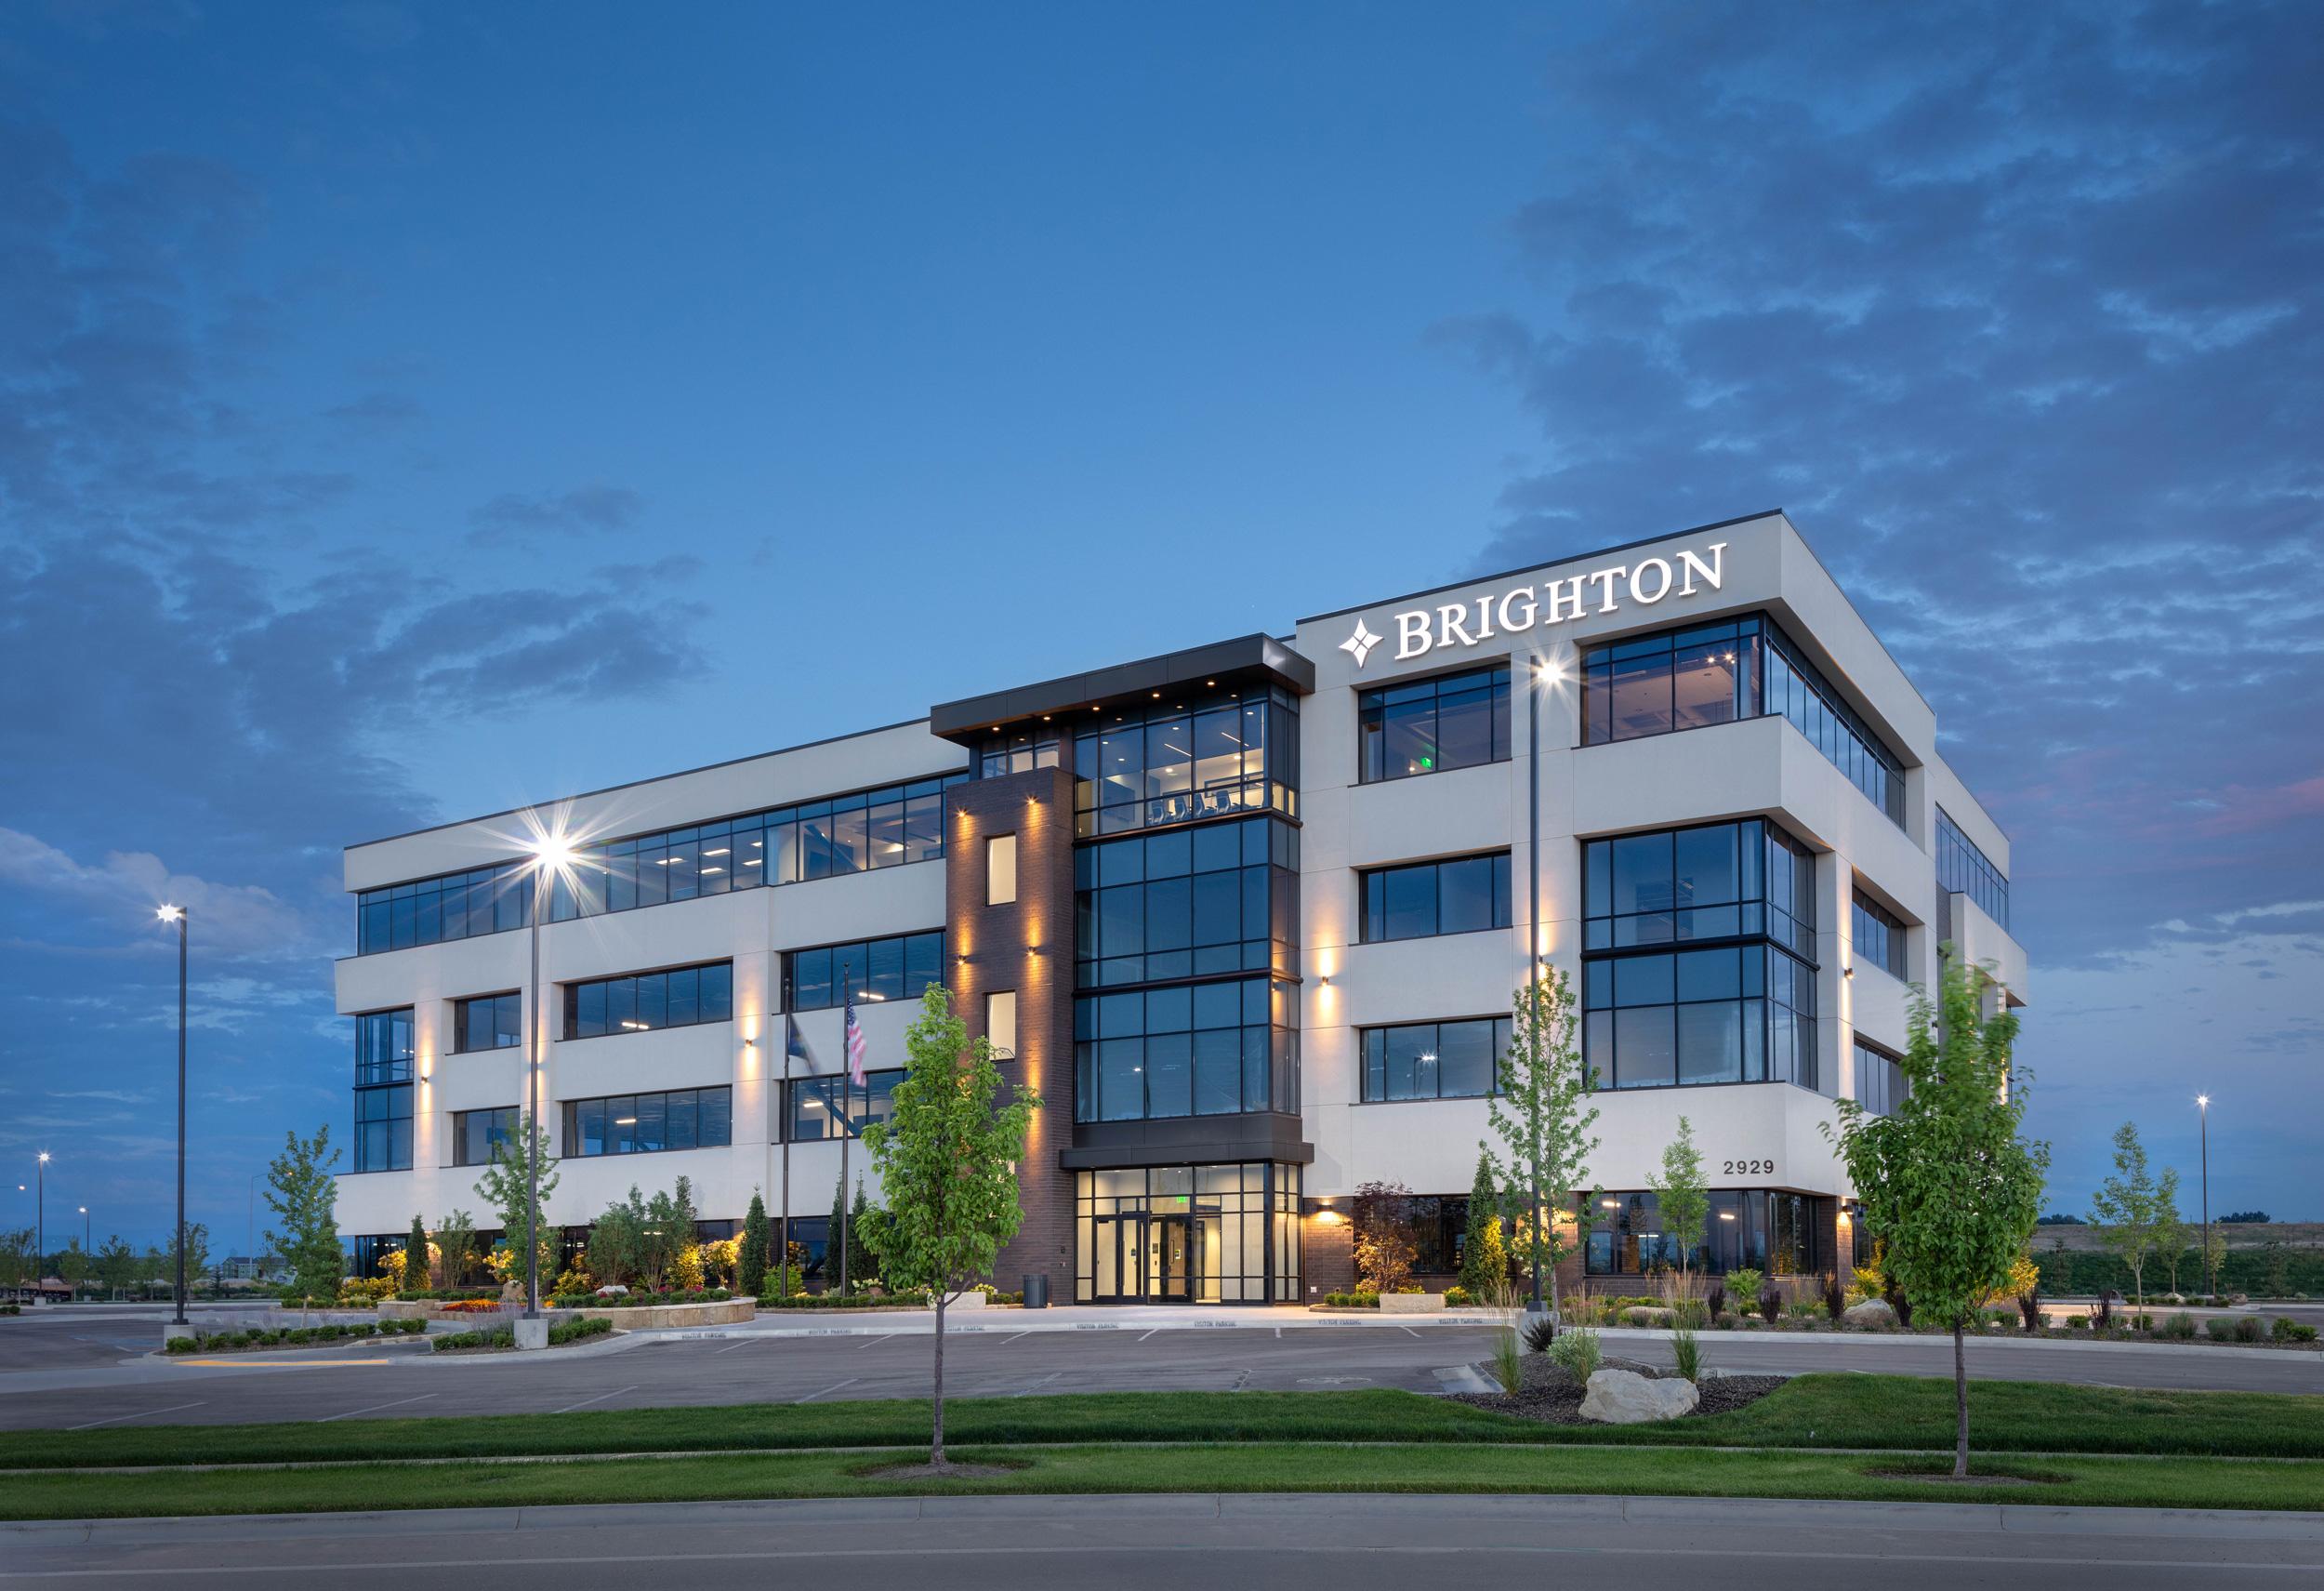 Brighton Corporation Headquarters Meridian Idaho